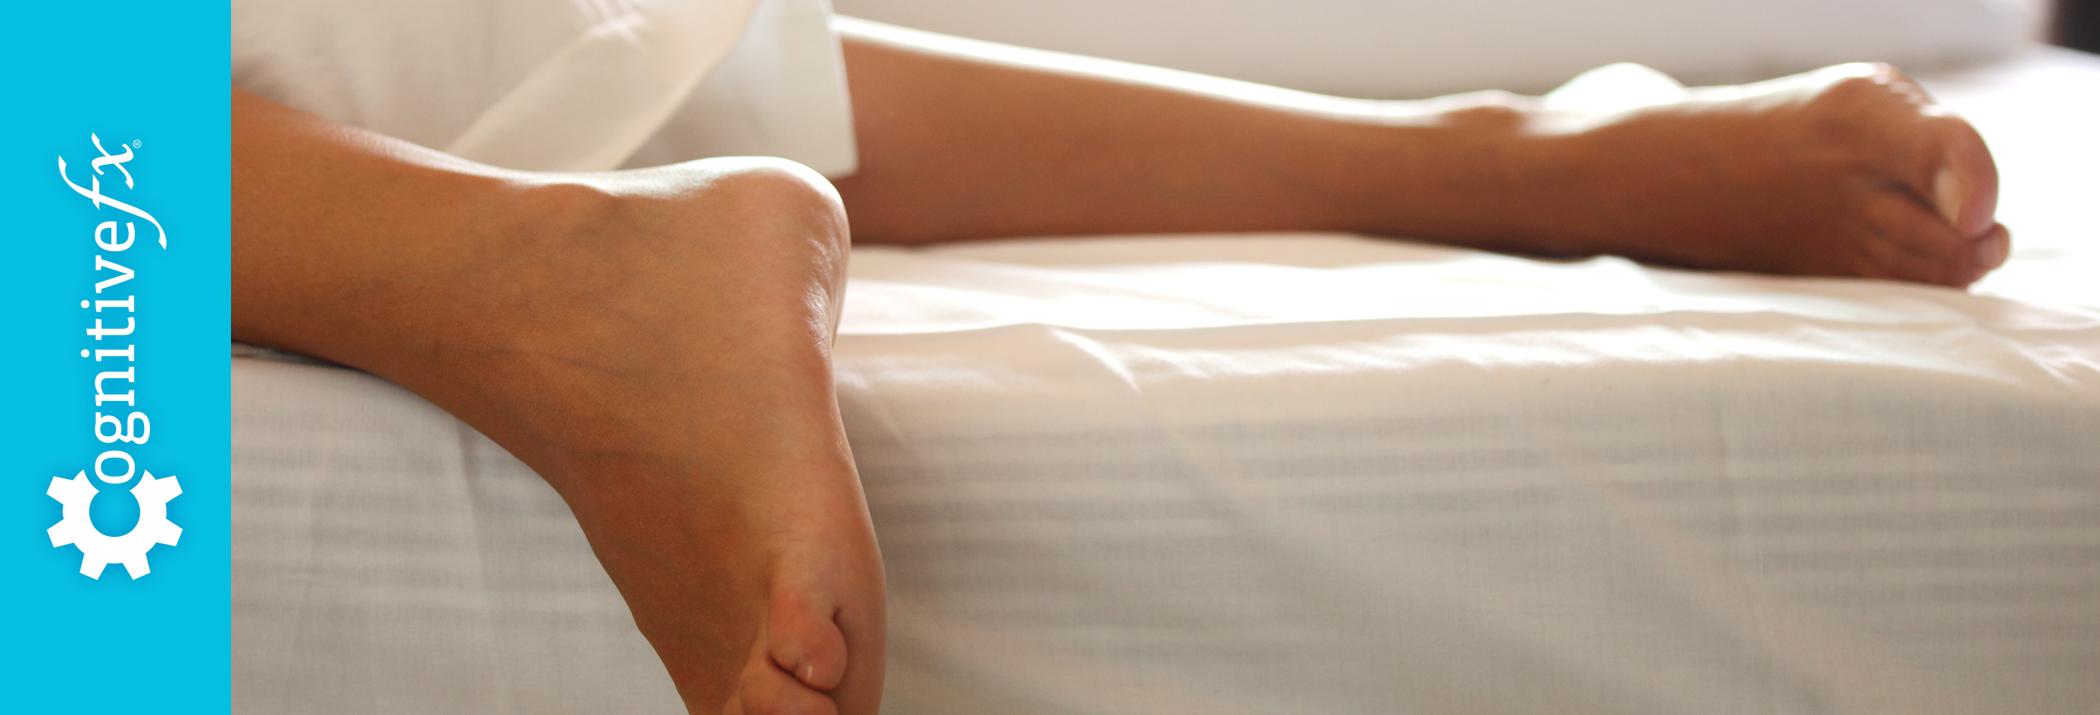 5 Ways to Improve Your Sleeping Habits